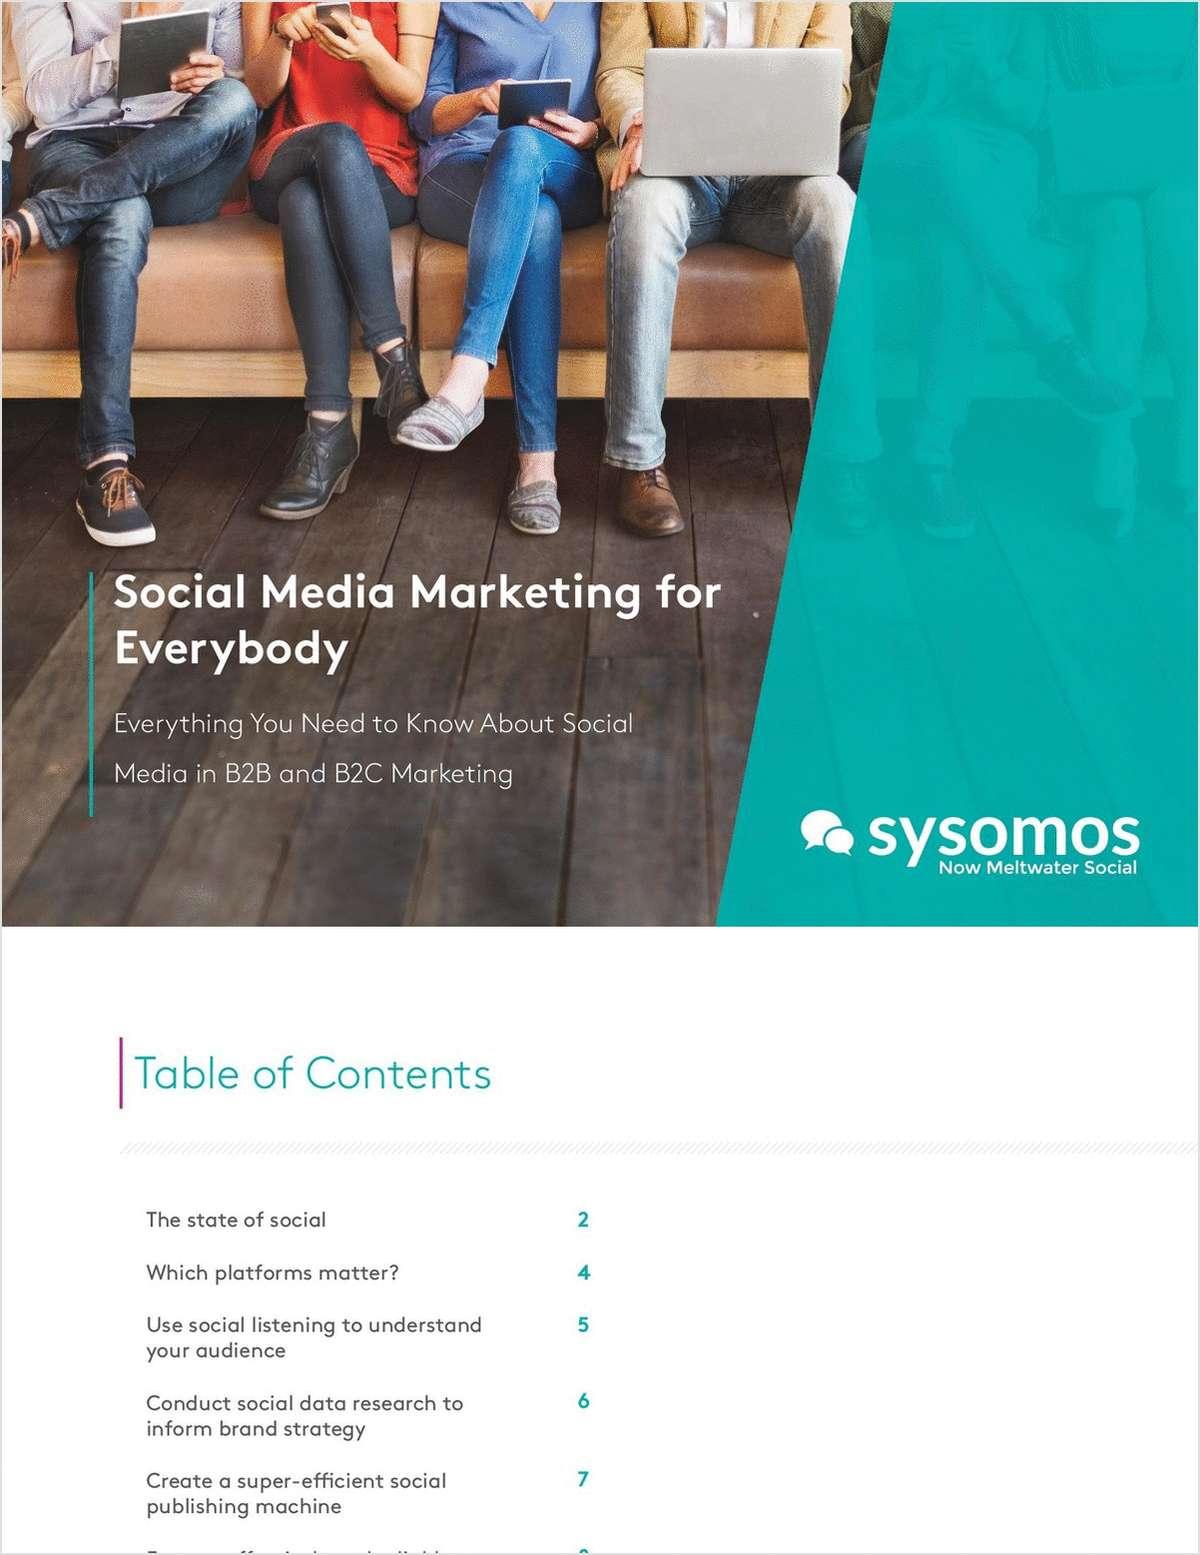 Complete Social Media Marketing Guide